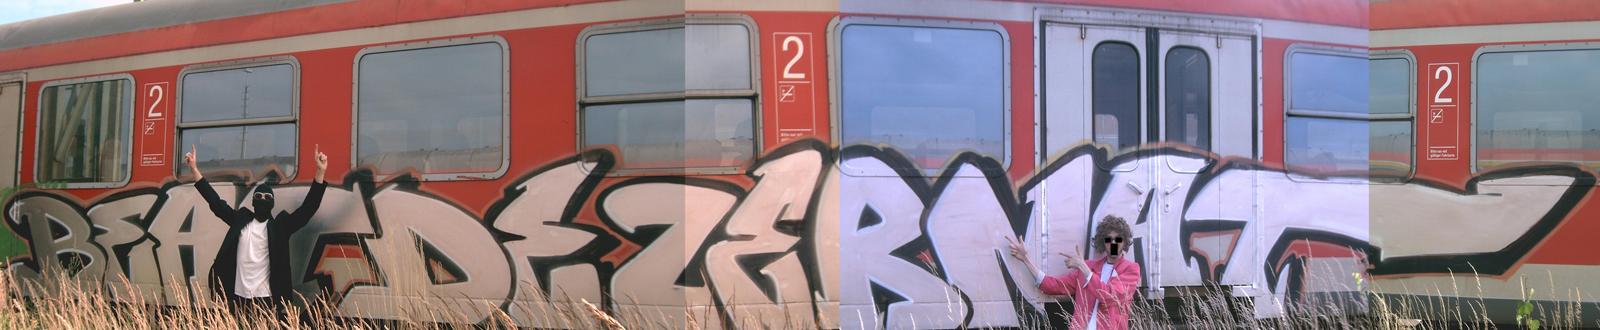 bdz_arts